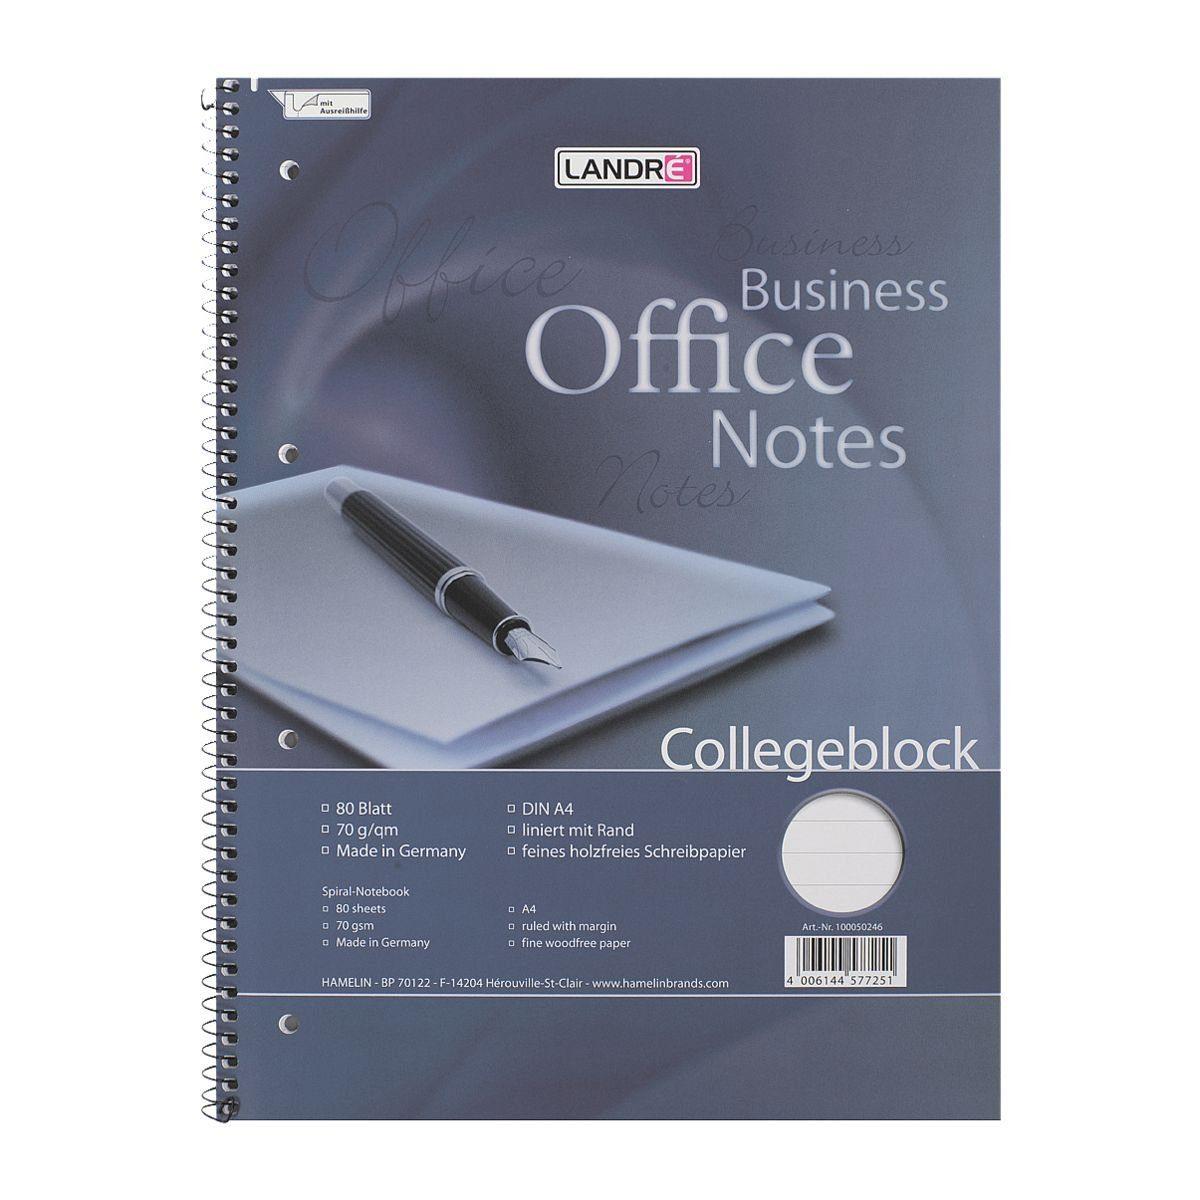 LANDRE Collegeblock 100050246 A4 liniert, holzfreies Schreibpapier »Work«